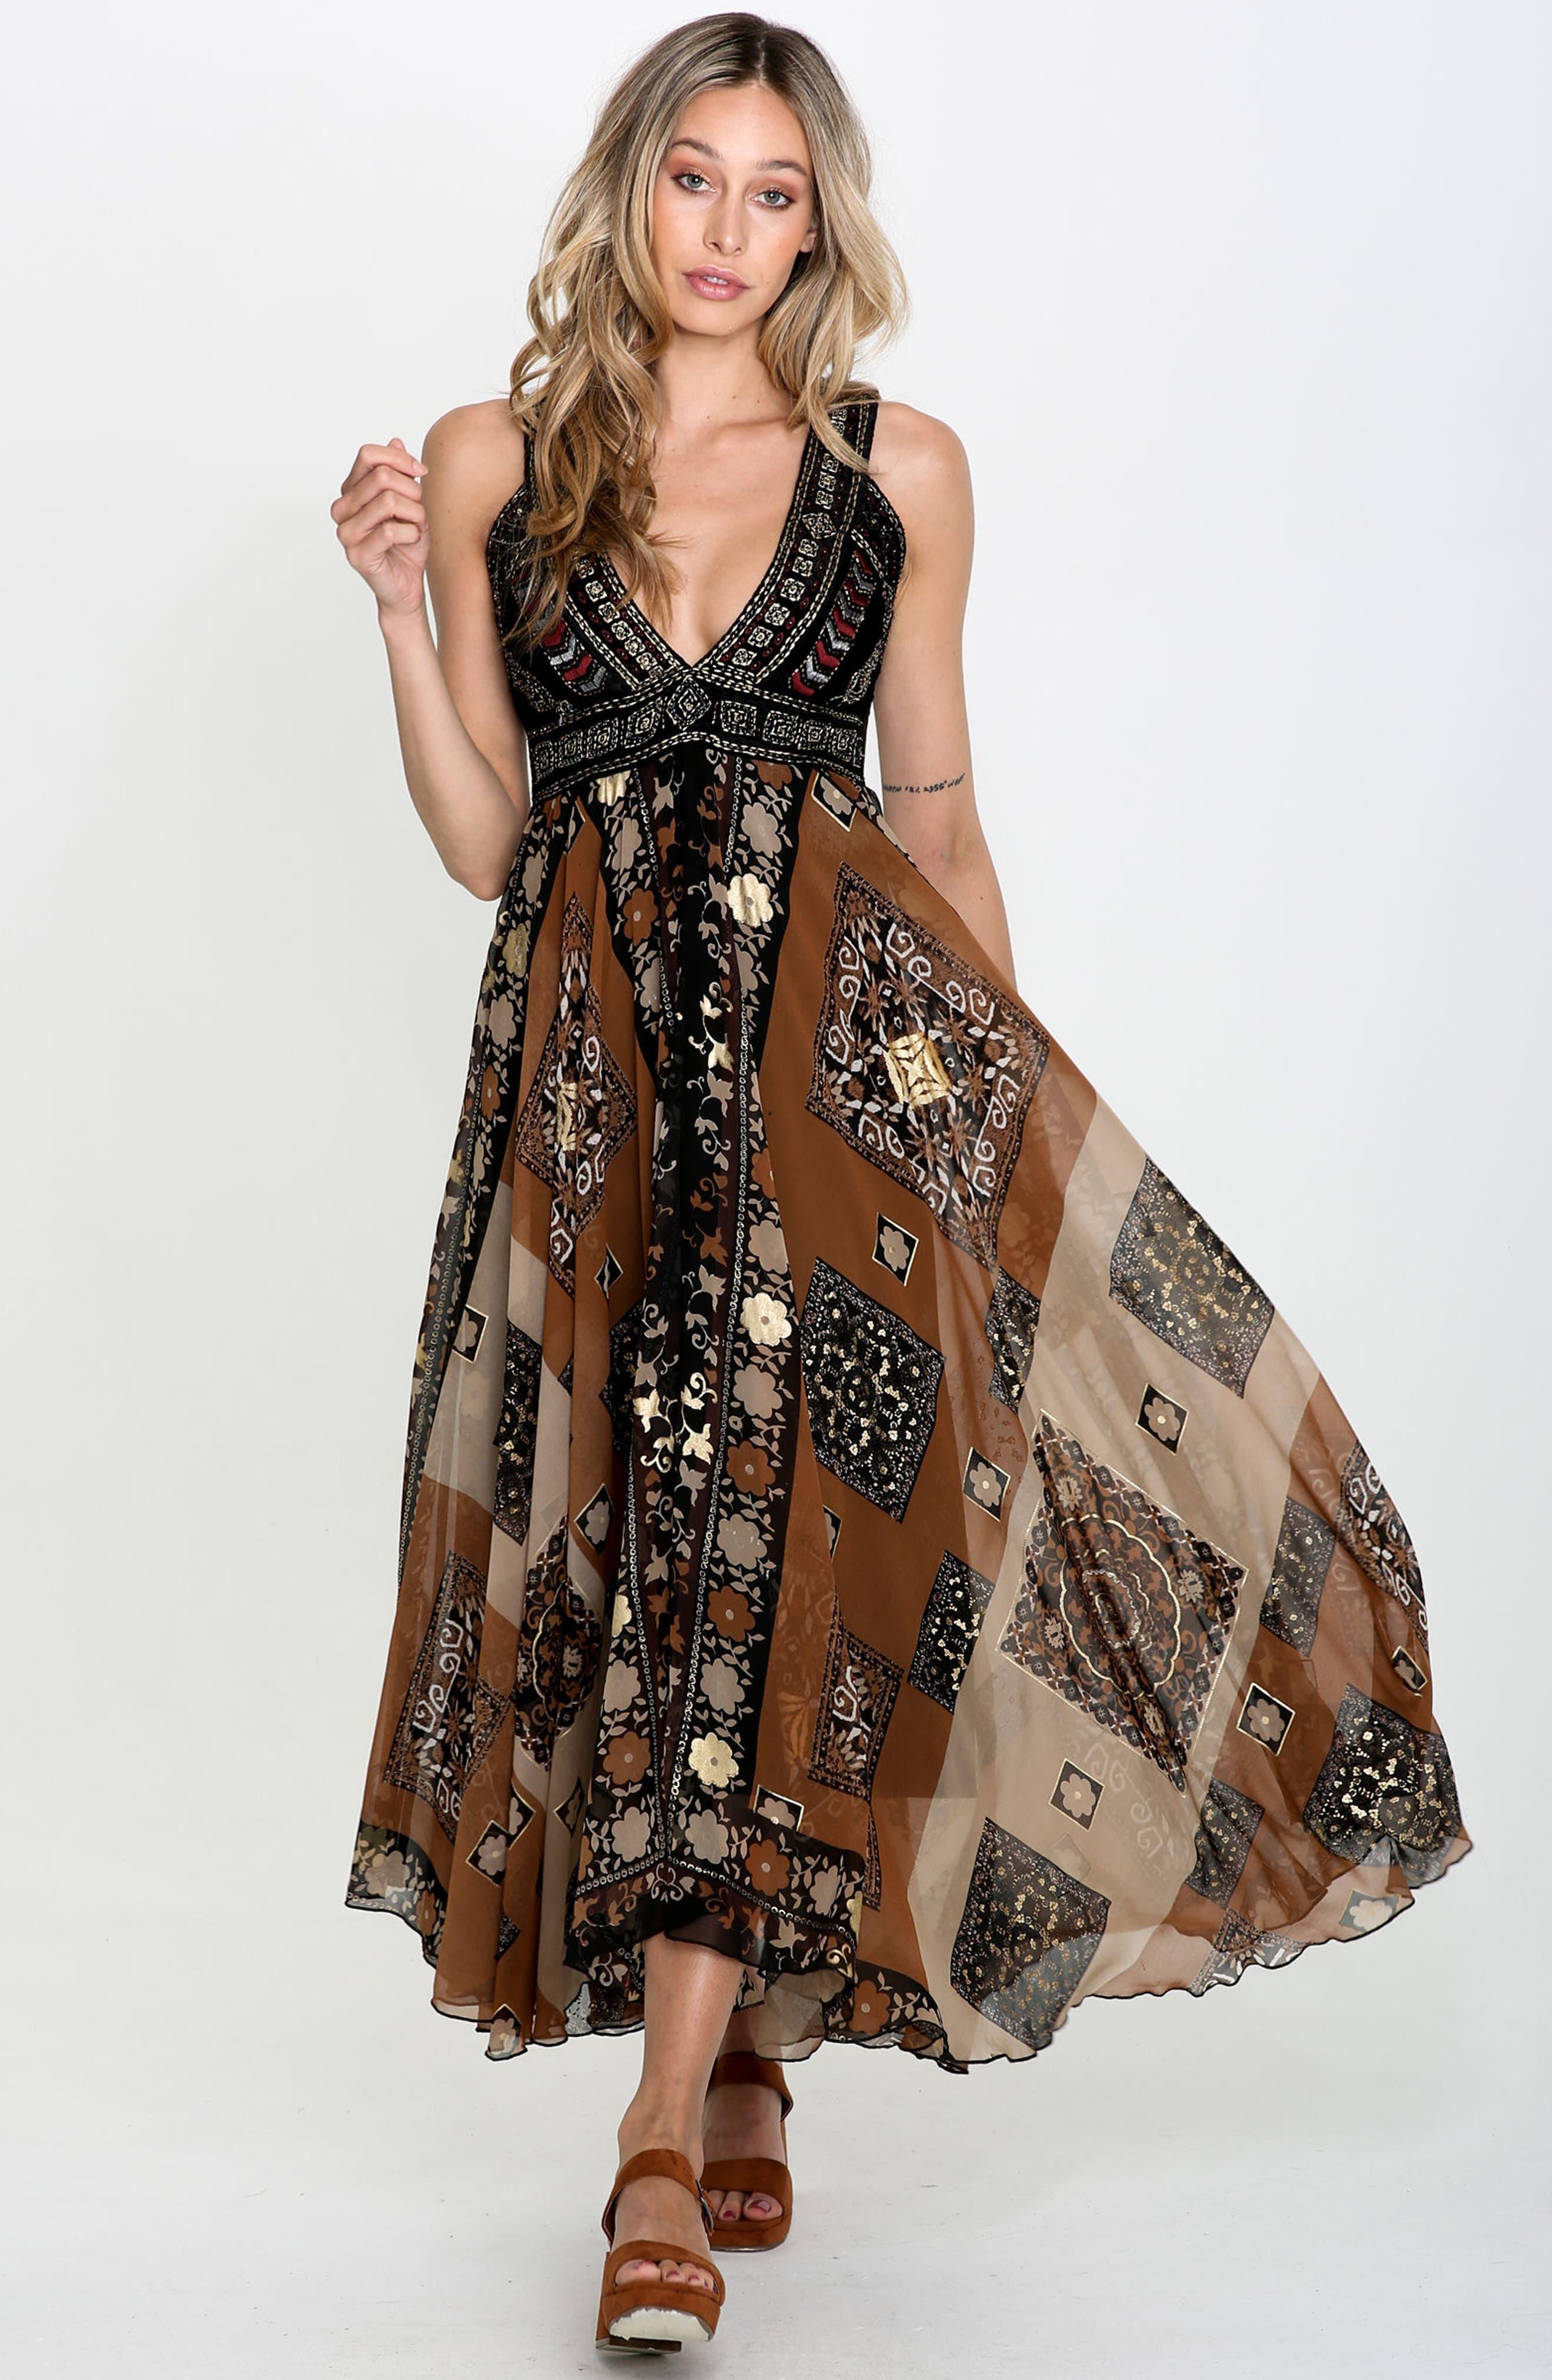 Sonder Embroidered Maxi Dress,                             Alternate thumbnail 7, color,                             200